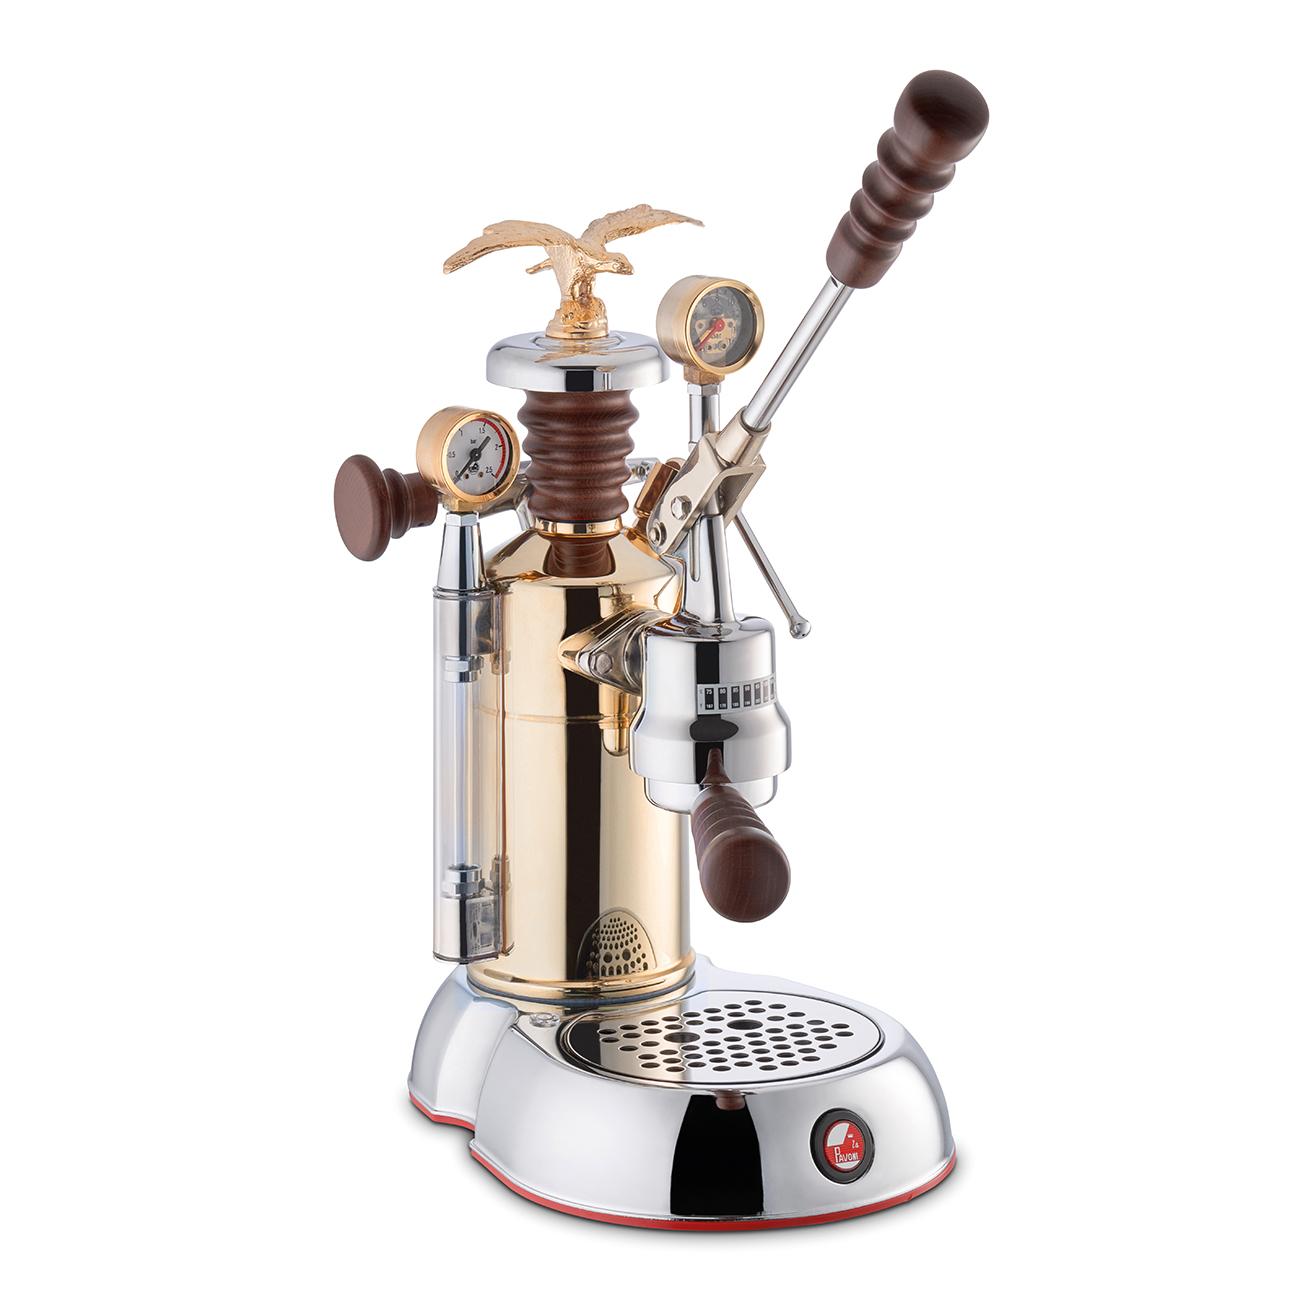 La Pavoni Esperto Handhebel Espressomaschine